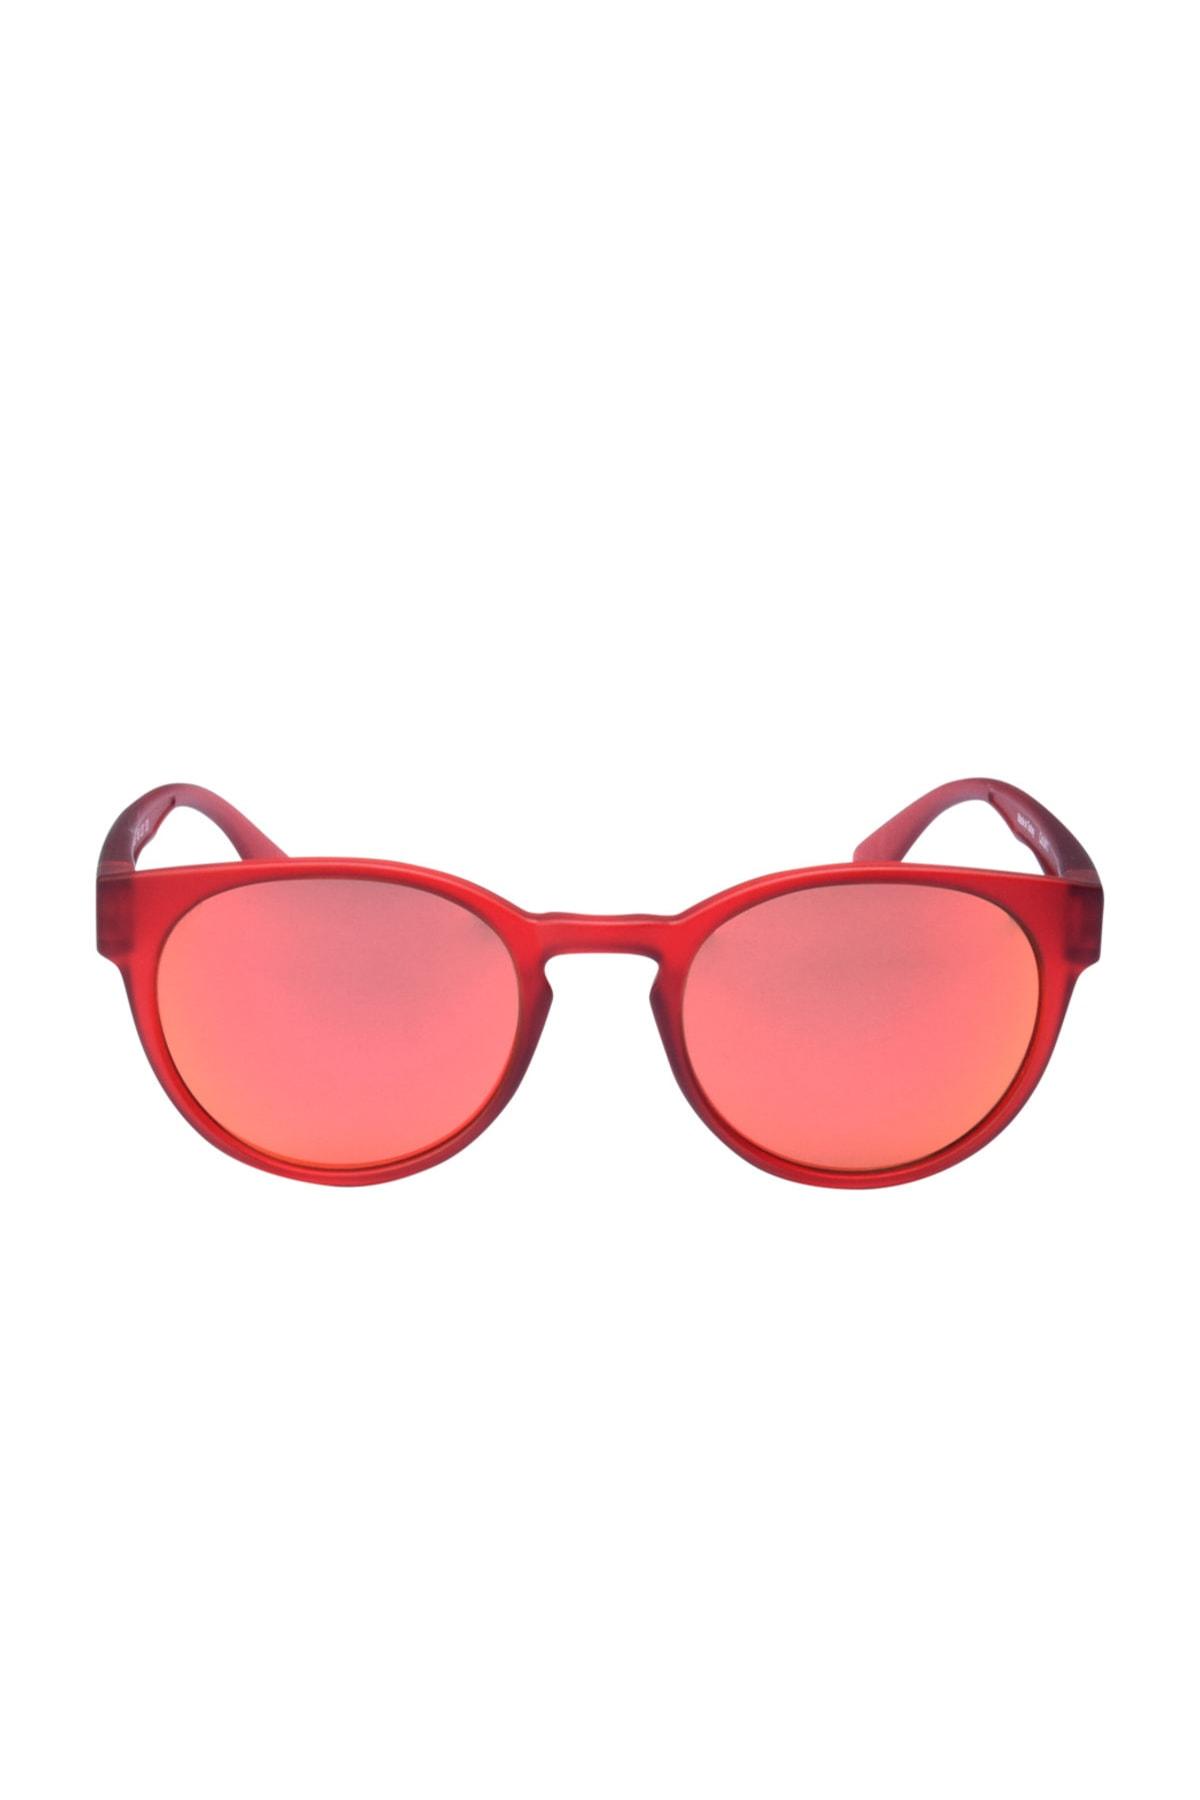 عینک آفتابی پسرانه قیمت مناسب برند INESTA KIDS رنگ بژ کد ty33199259